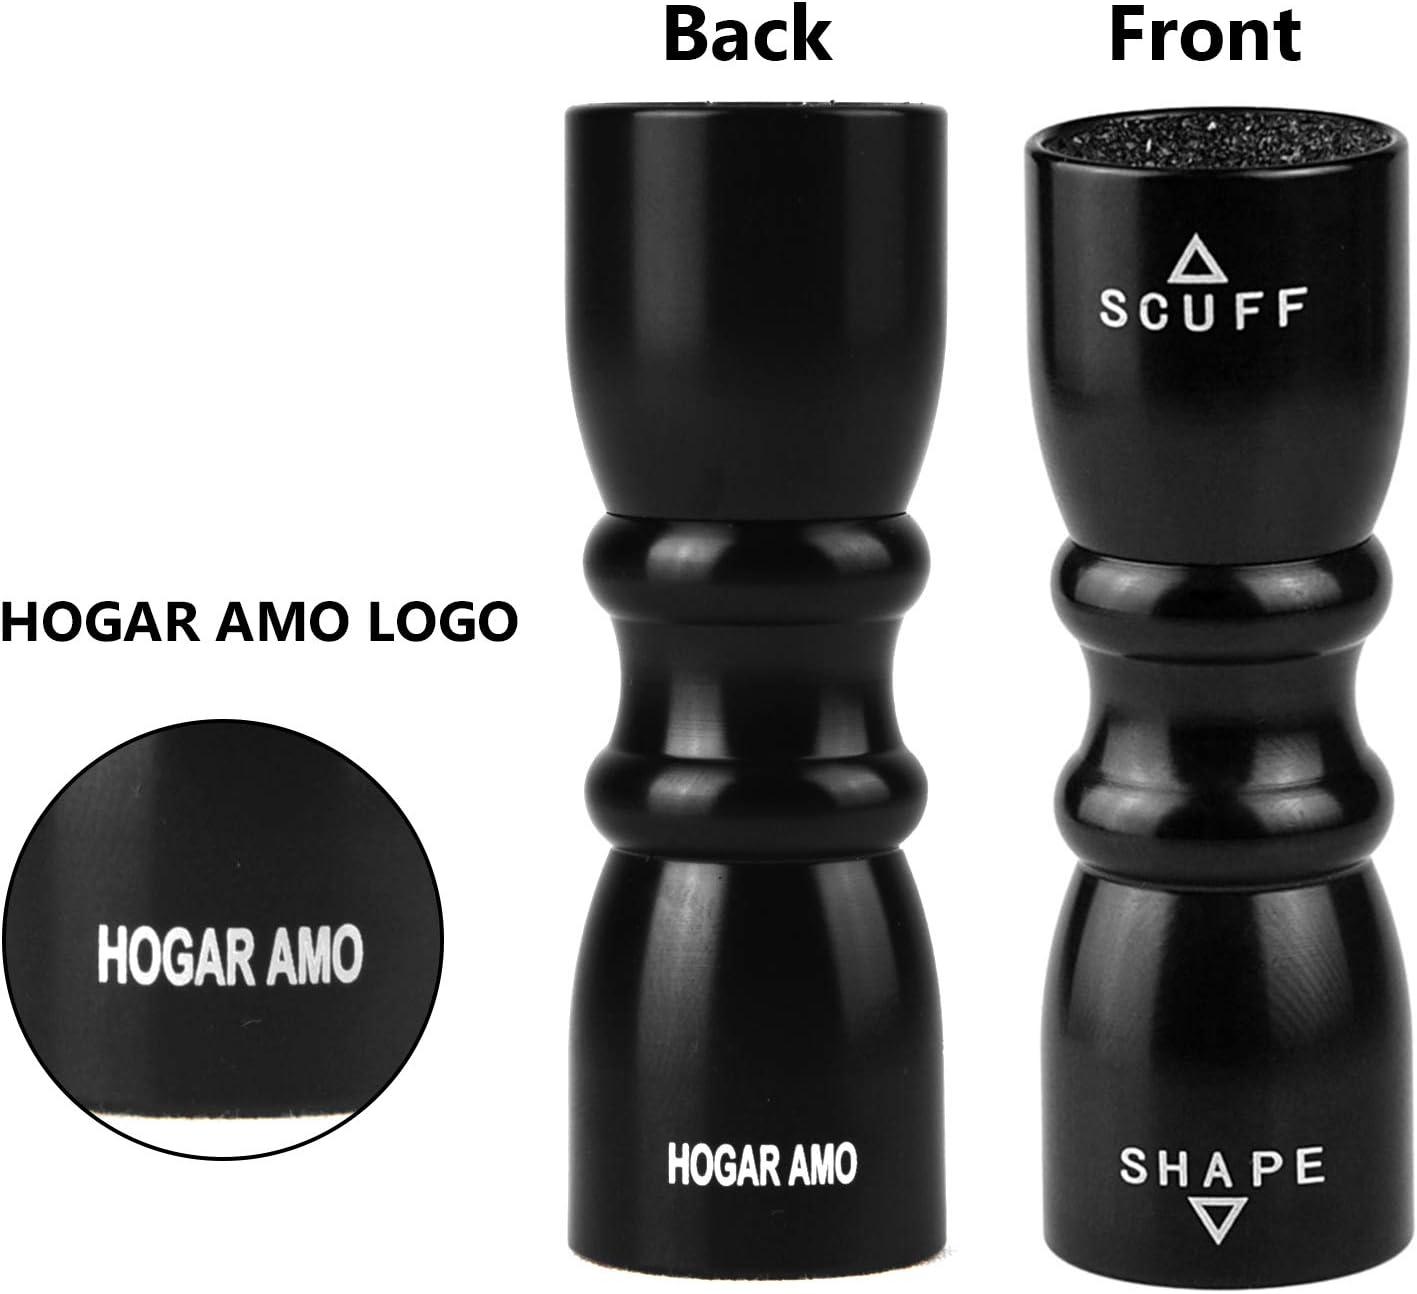 HOGAR AMO Billiard//Pool//Snooker Bowtie Cue Tips Stick Cue Care Accessory Scuffer-Shaper-Aerator 3-in-1 Stainless Steel Billiard Cue Tip Tool Repair Tools